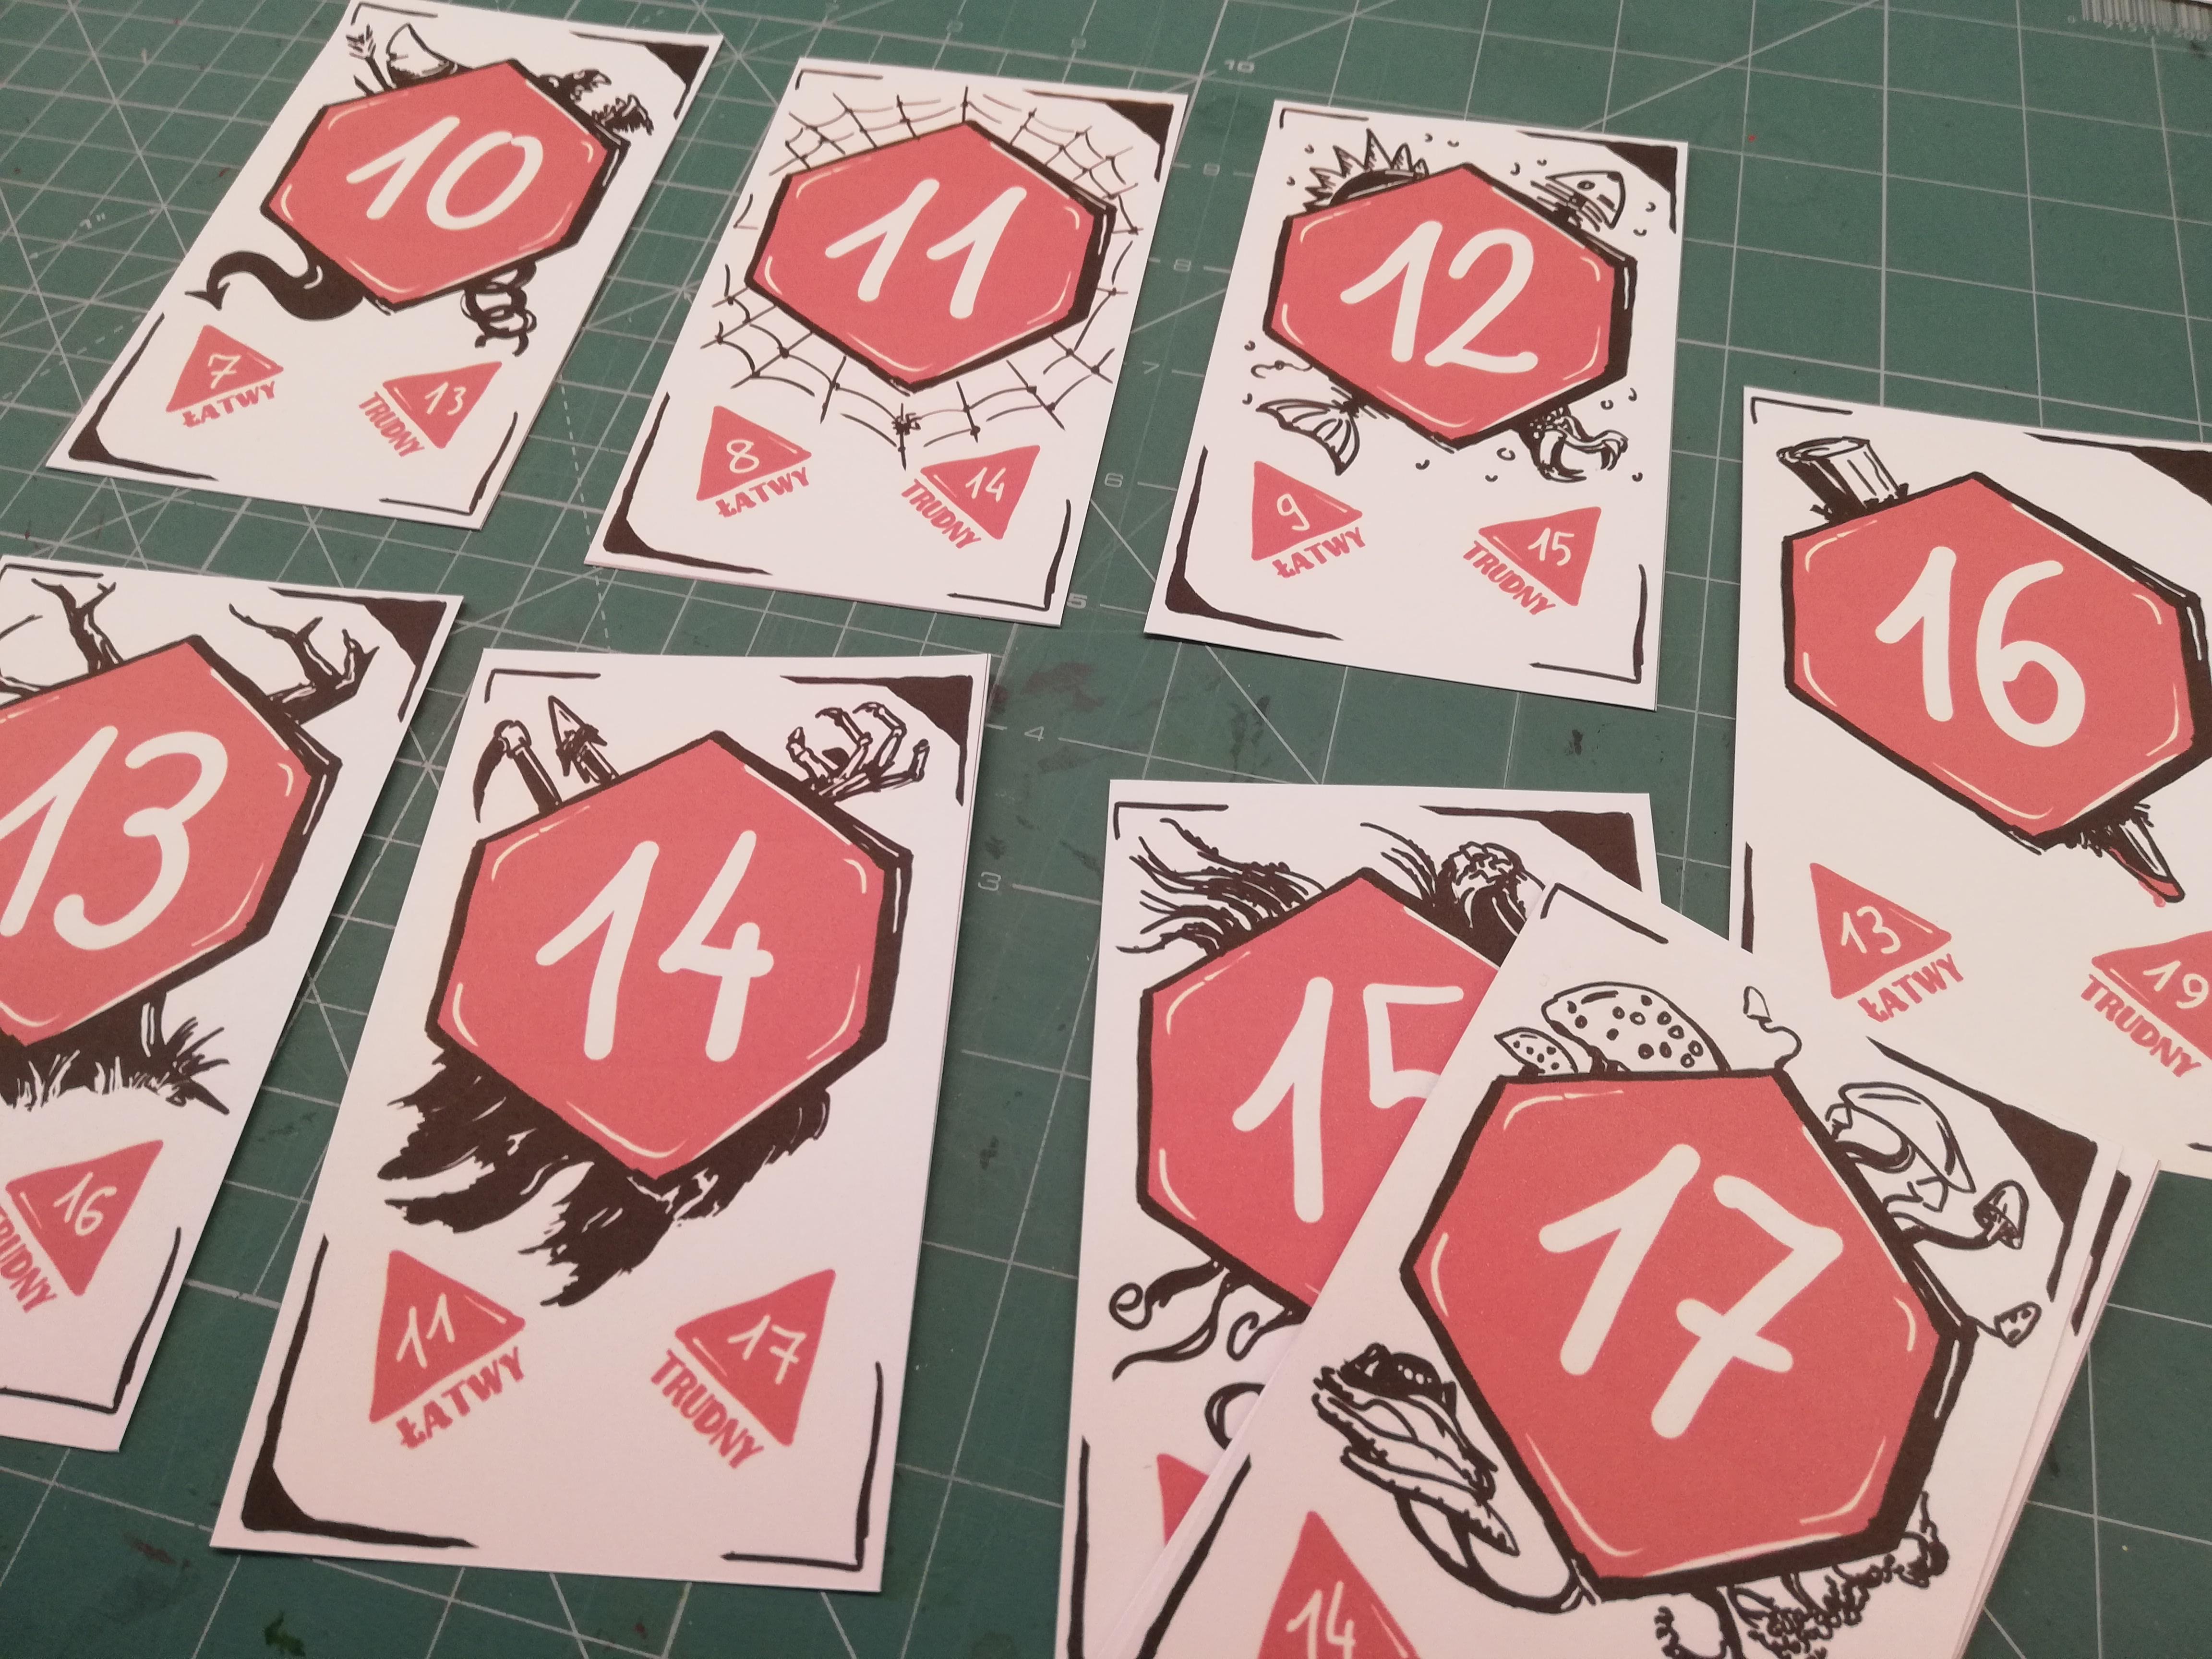 ICRPG Target Cards - Resources - RUNEHAMMER